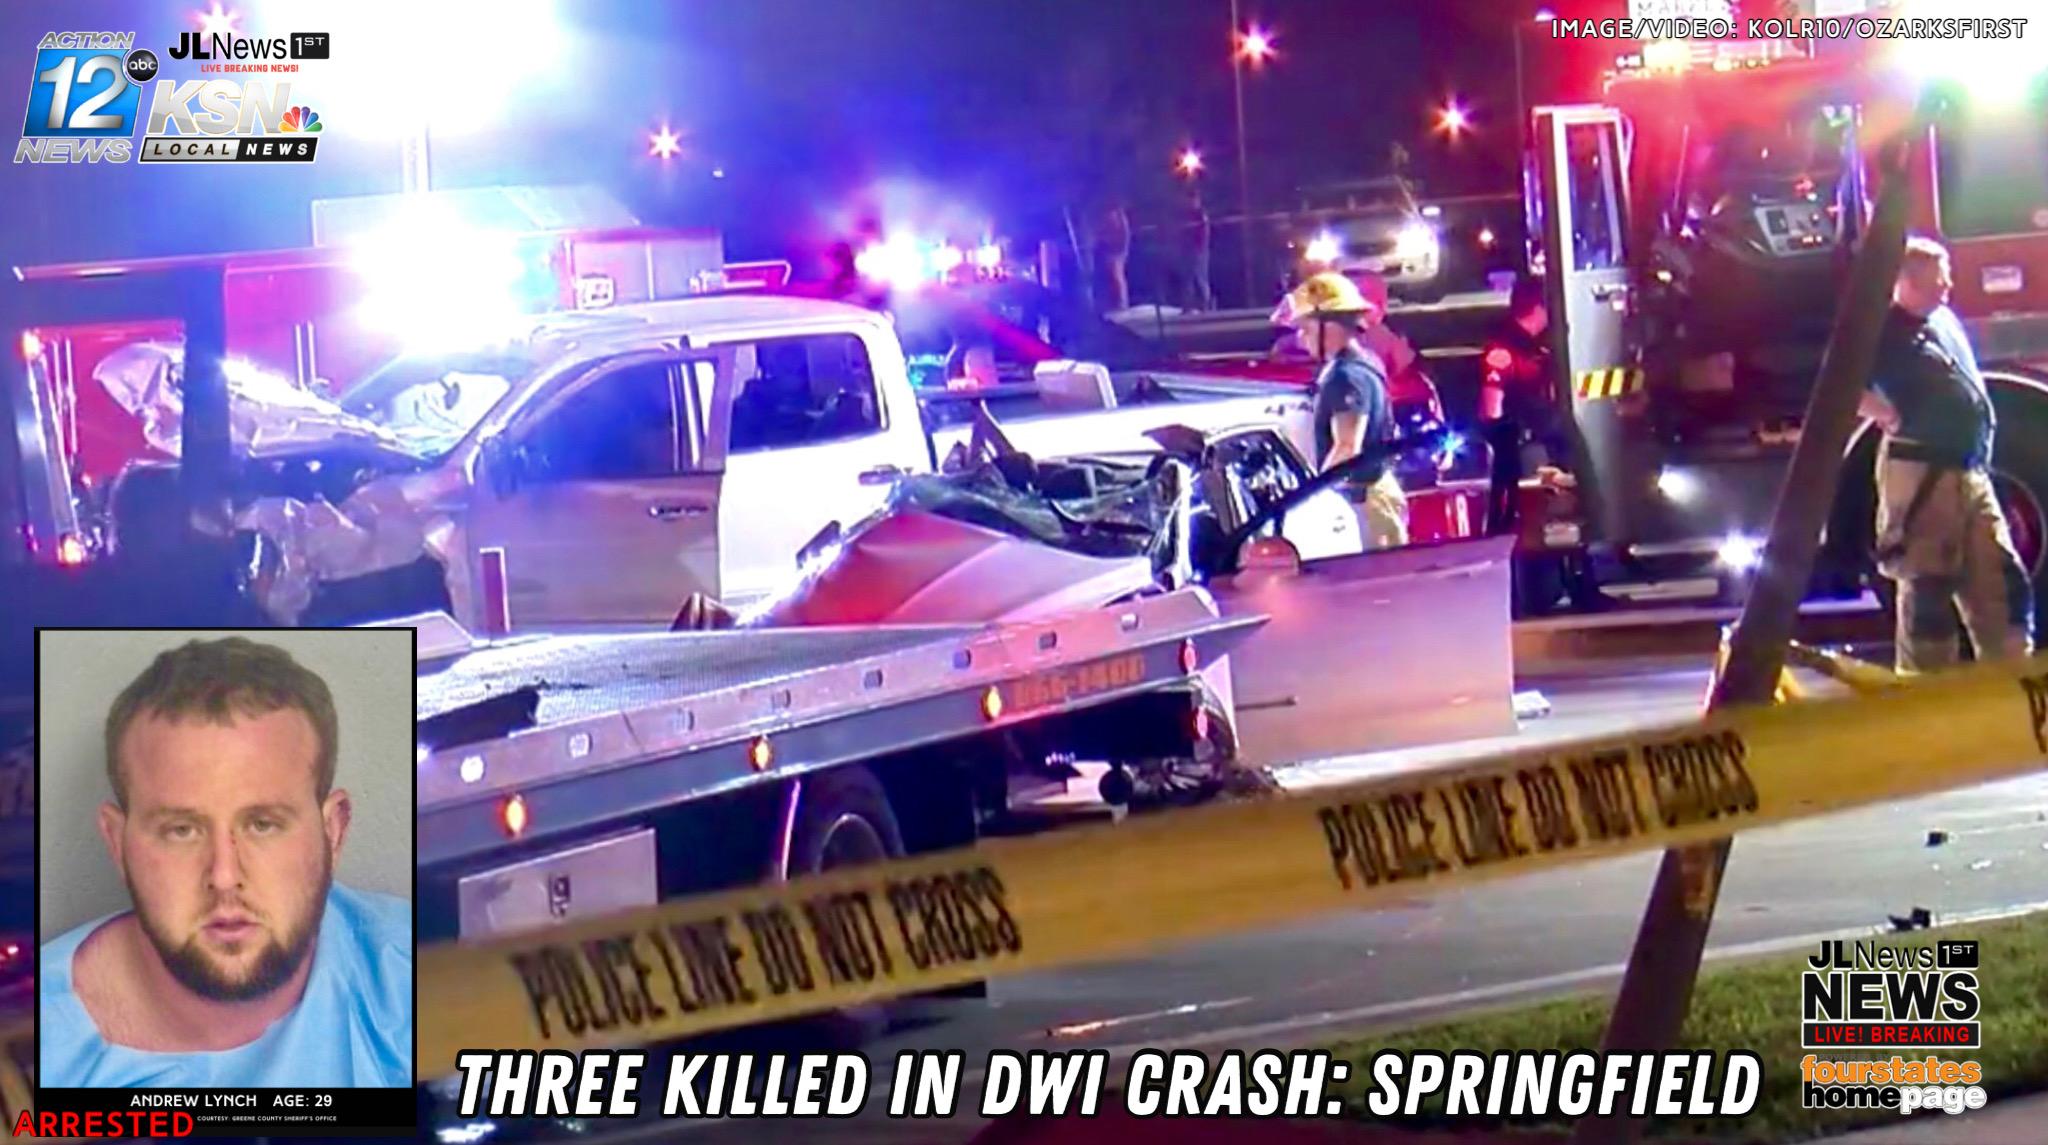 THREE KILLED IN DWI CRASH IN SPRINGFIELD | KSNF/KODE